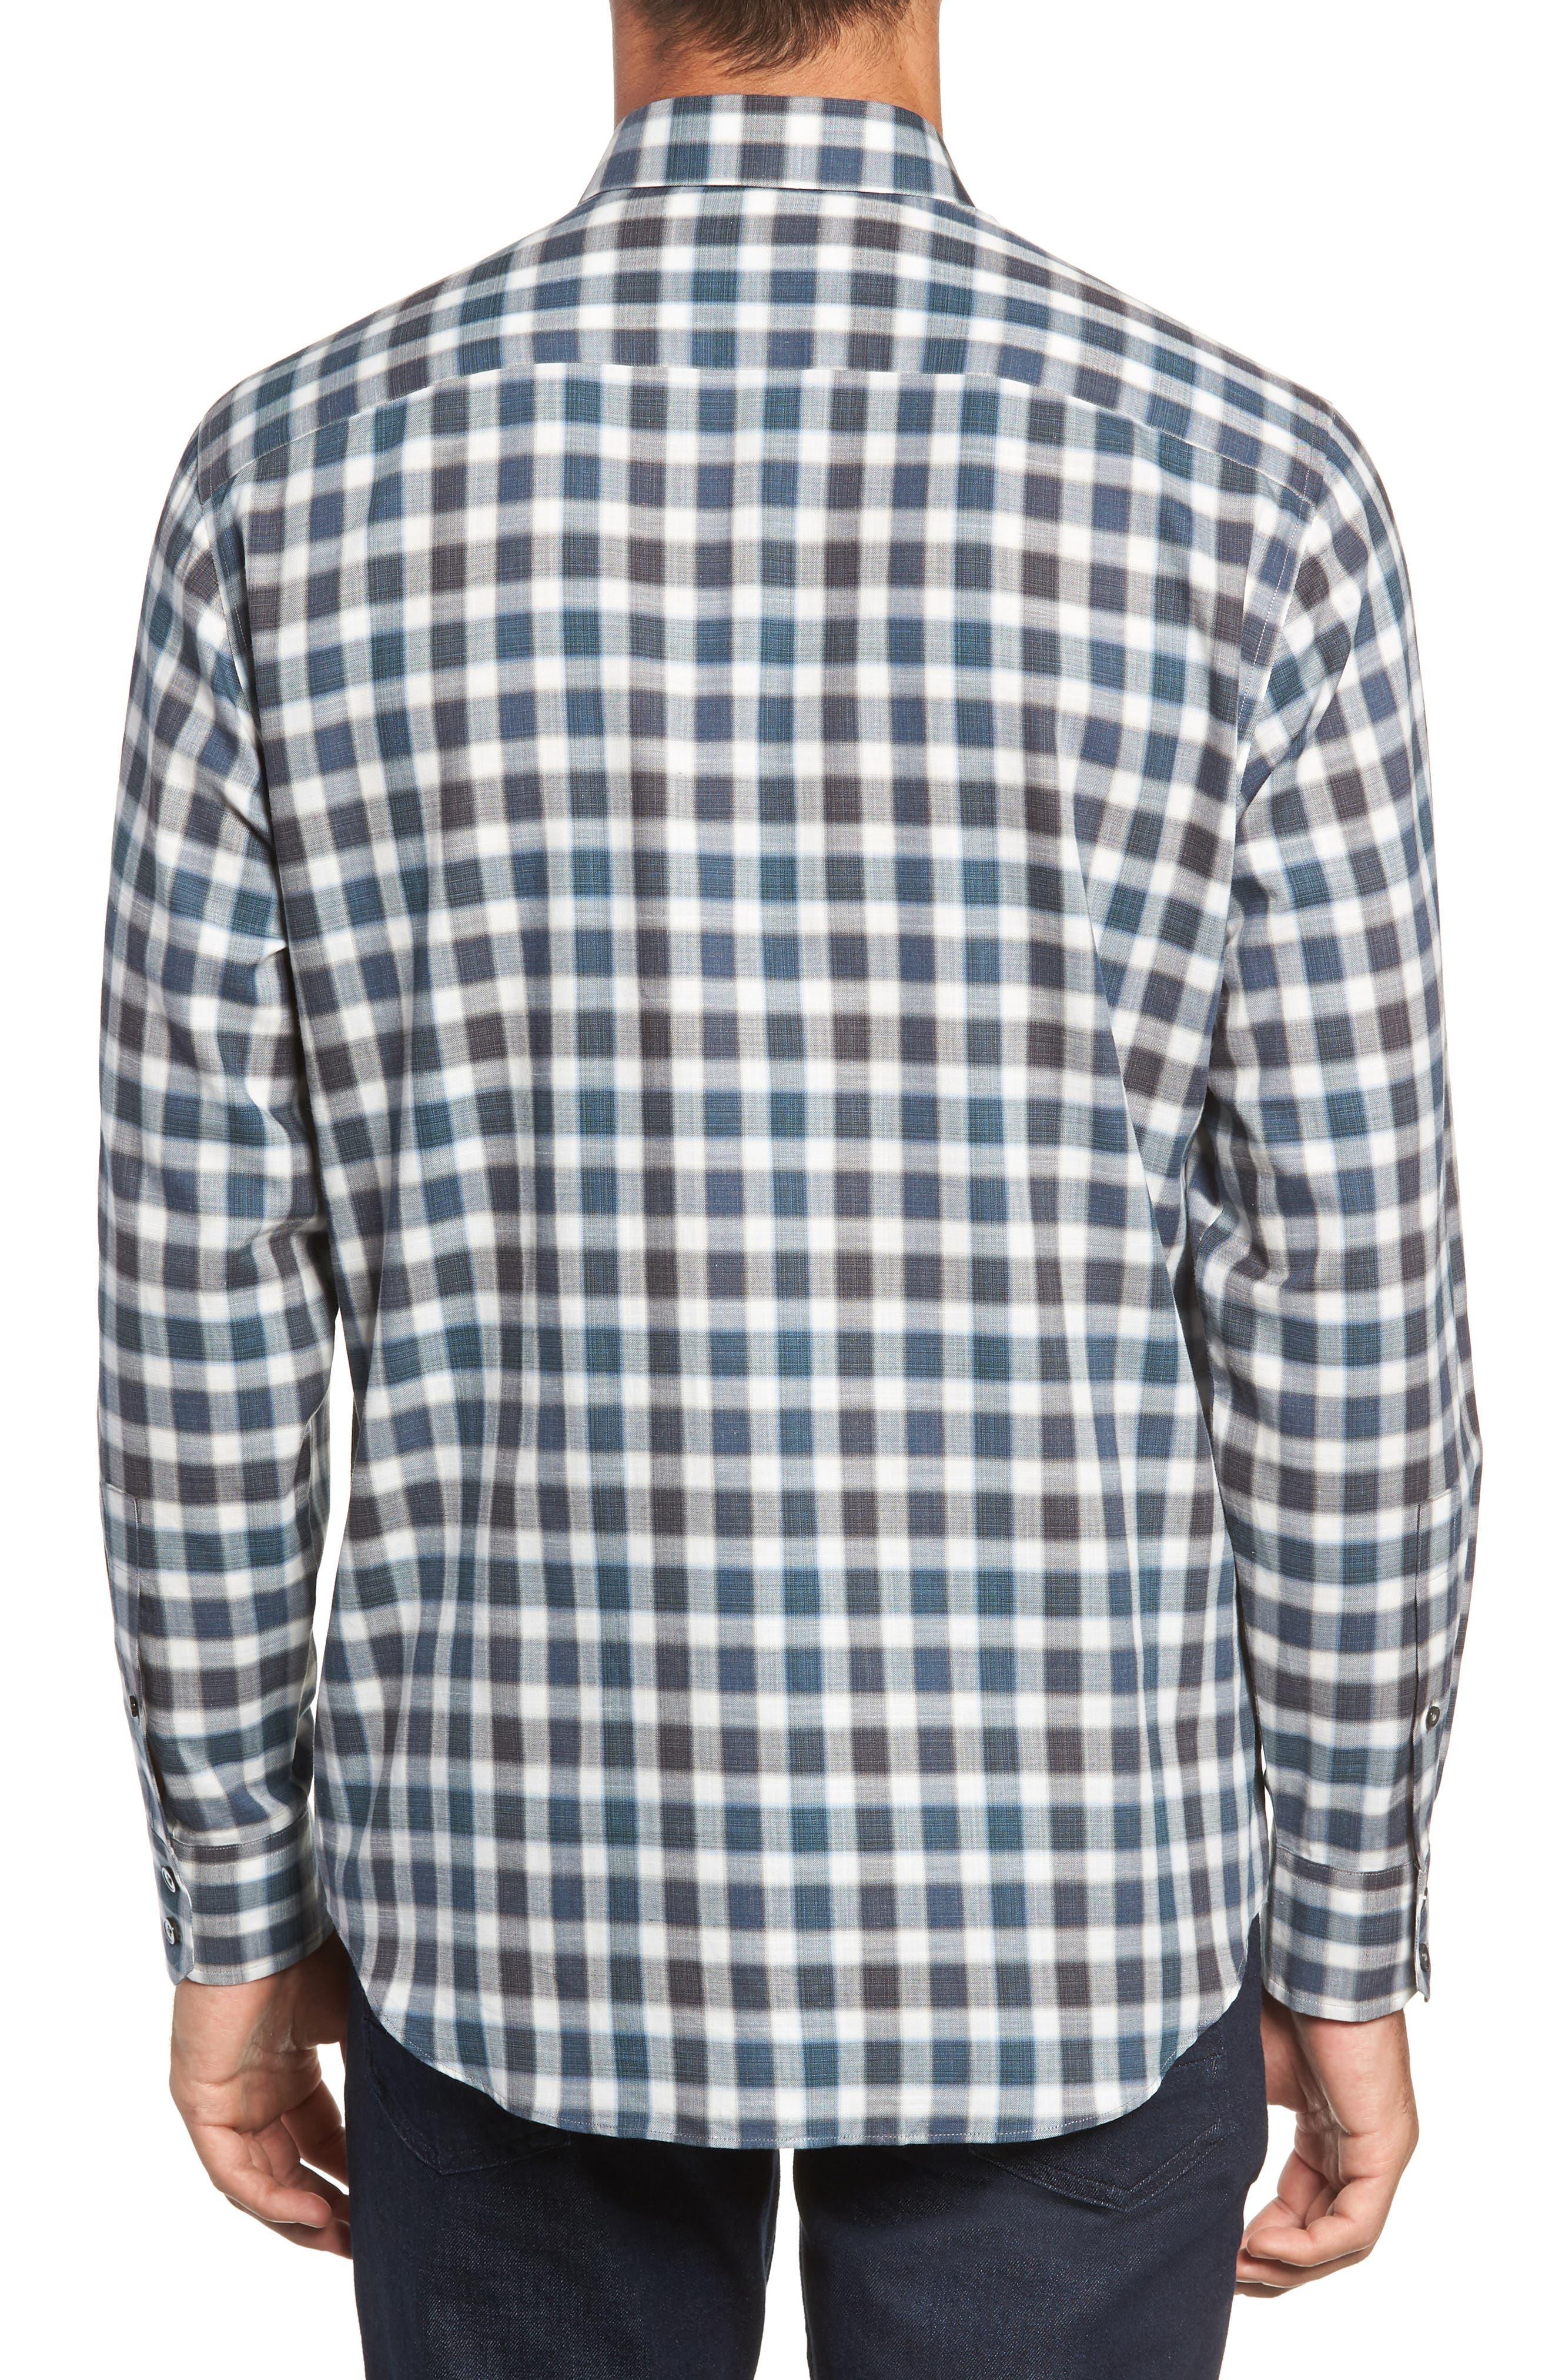 ZACHARY PRELL, Buffa Regular Fit Plaid Flannel Sport Shirt, Alternate thumbnail 3, color, DARK TEAL